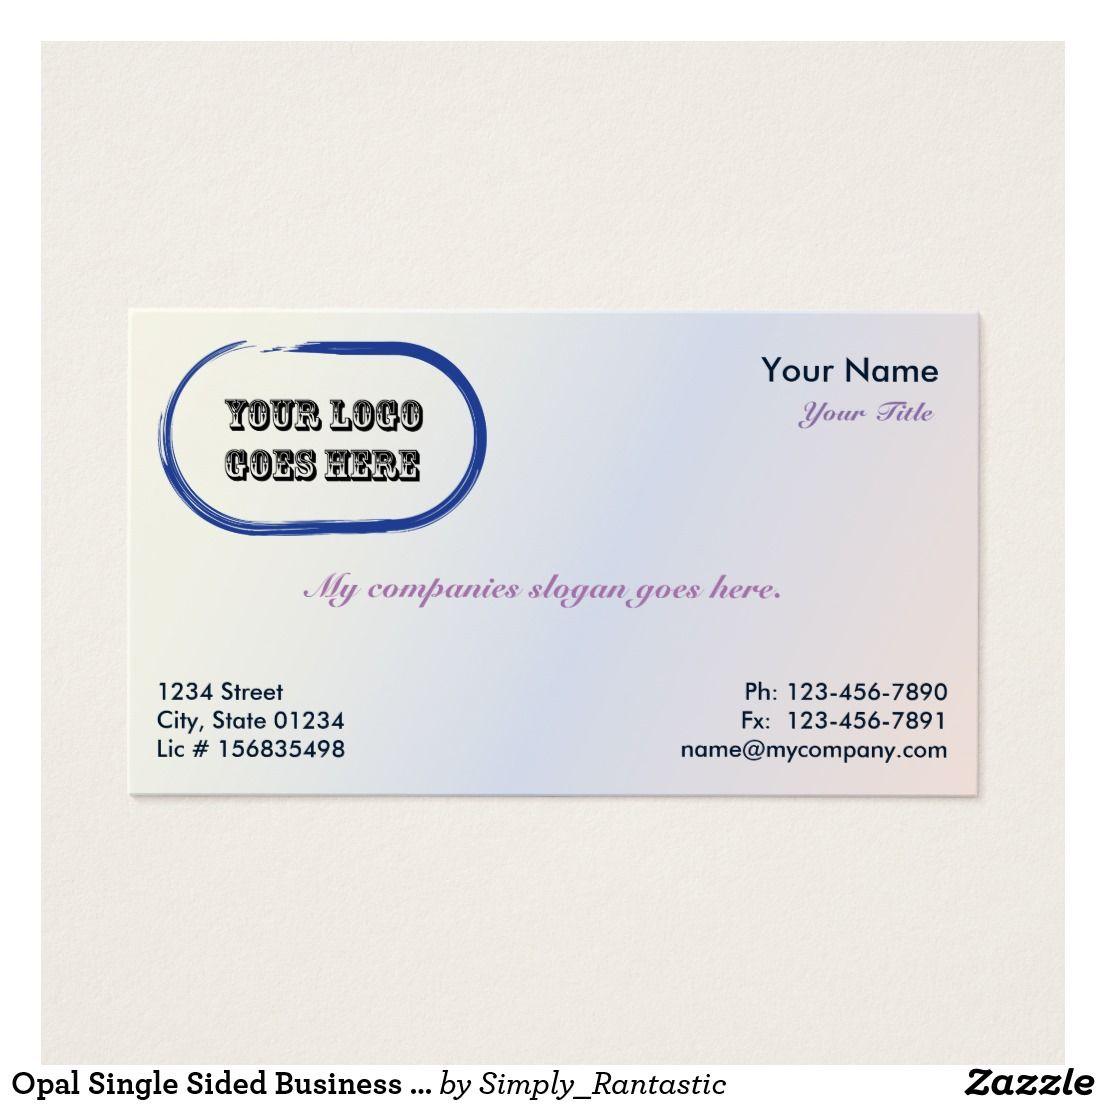 Opal single sided business card template v2 card templates opal single sided business card template v2 flashek Gallery